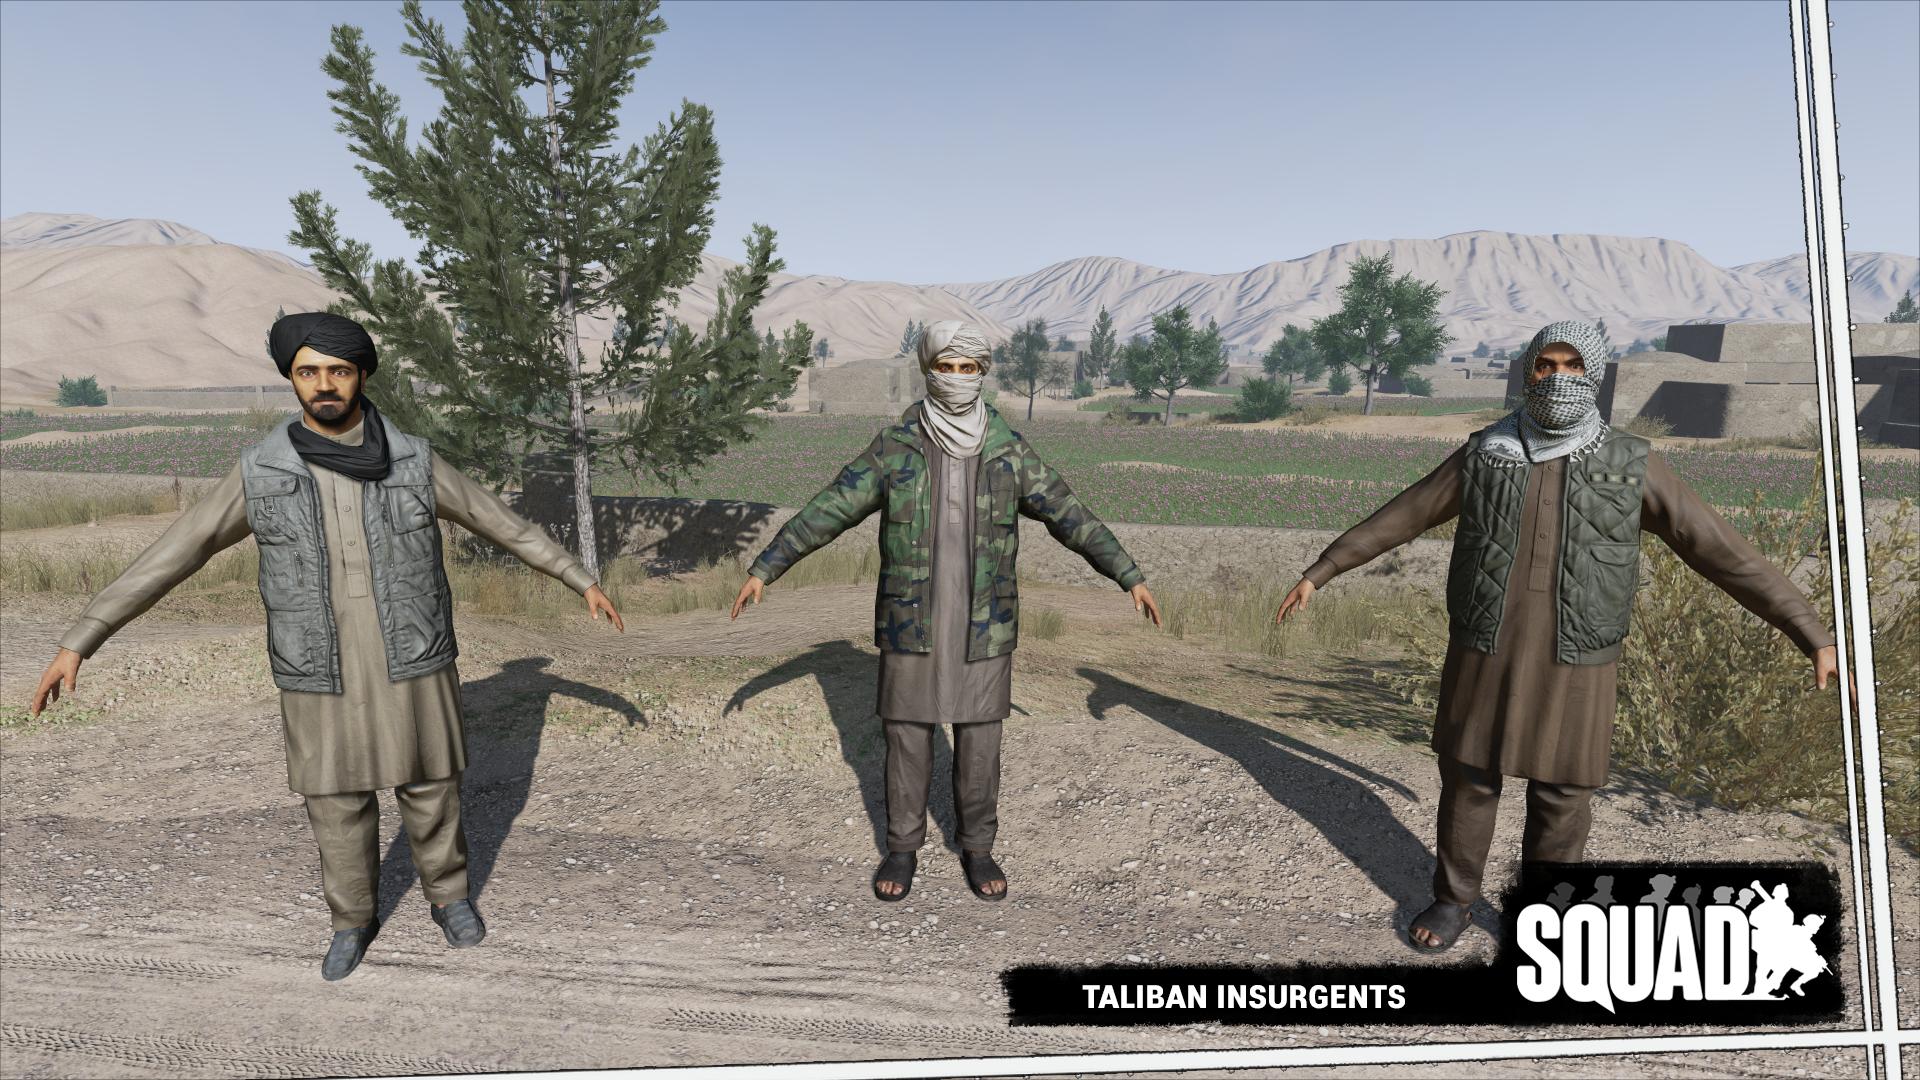 squad_taliban.png